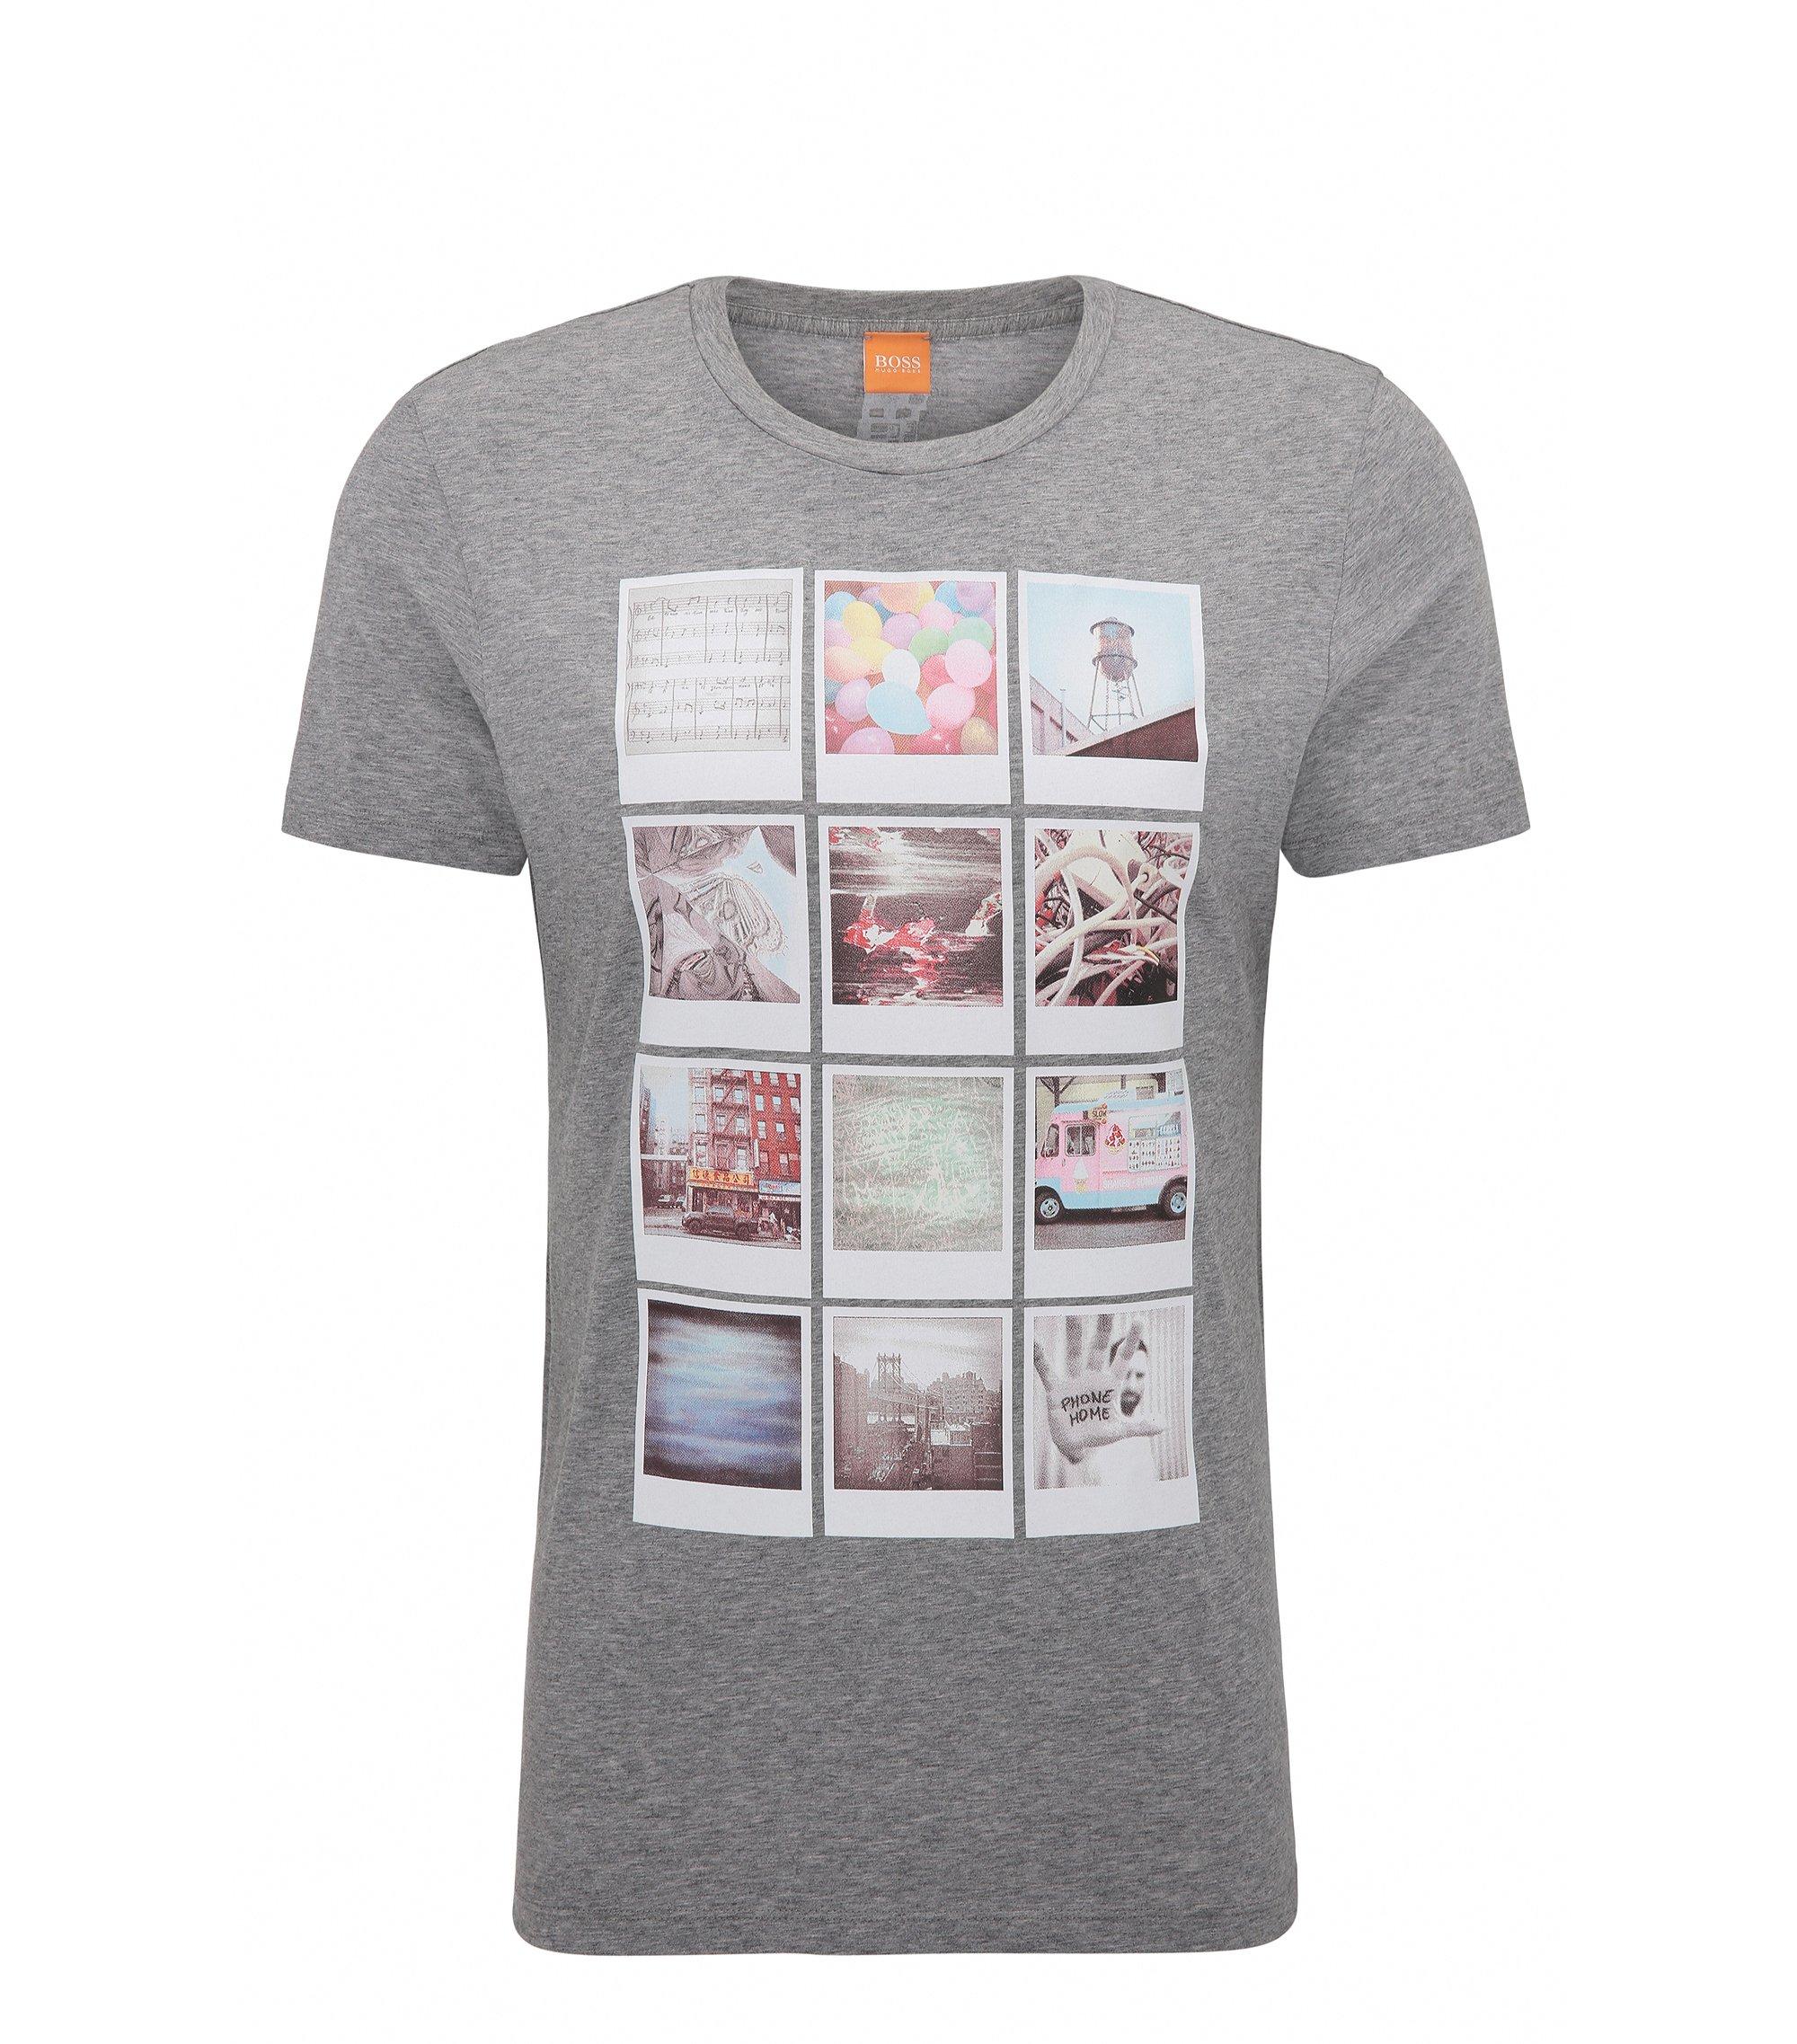 Regular-Fit T-Shirt aus Baumwolle mit Polaroid-Print, Hellgrau